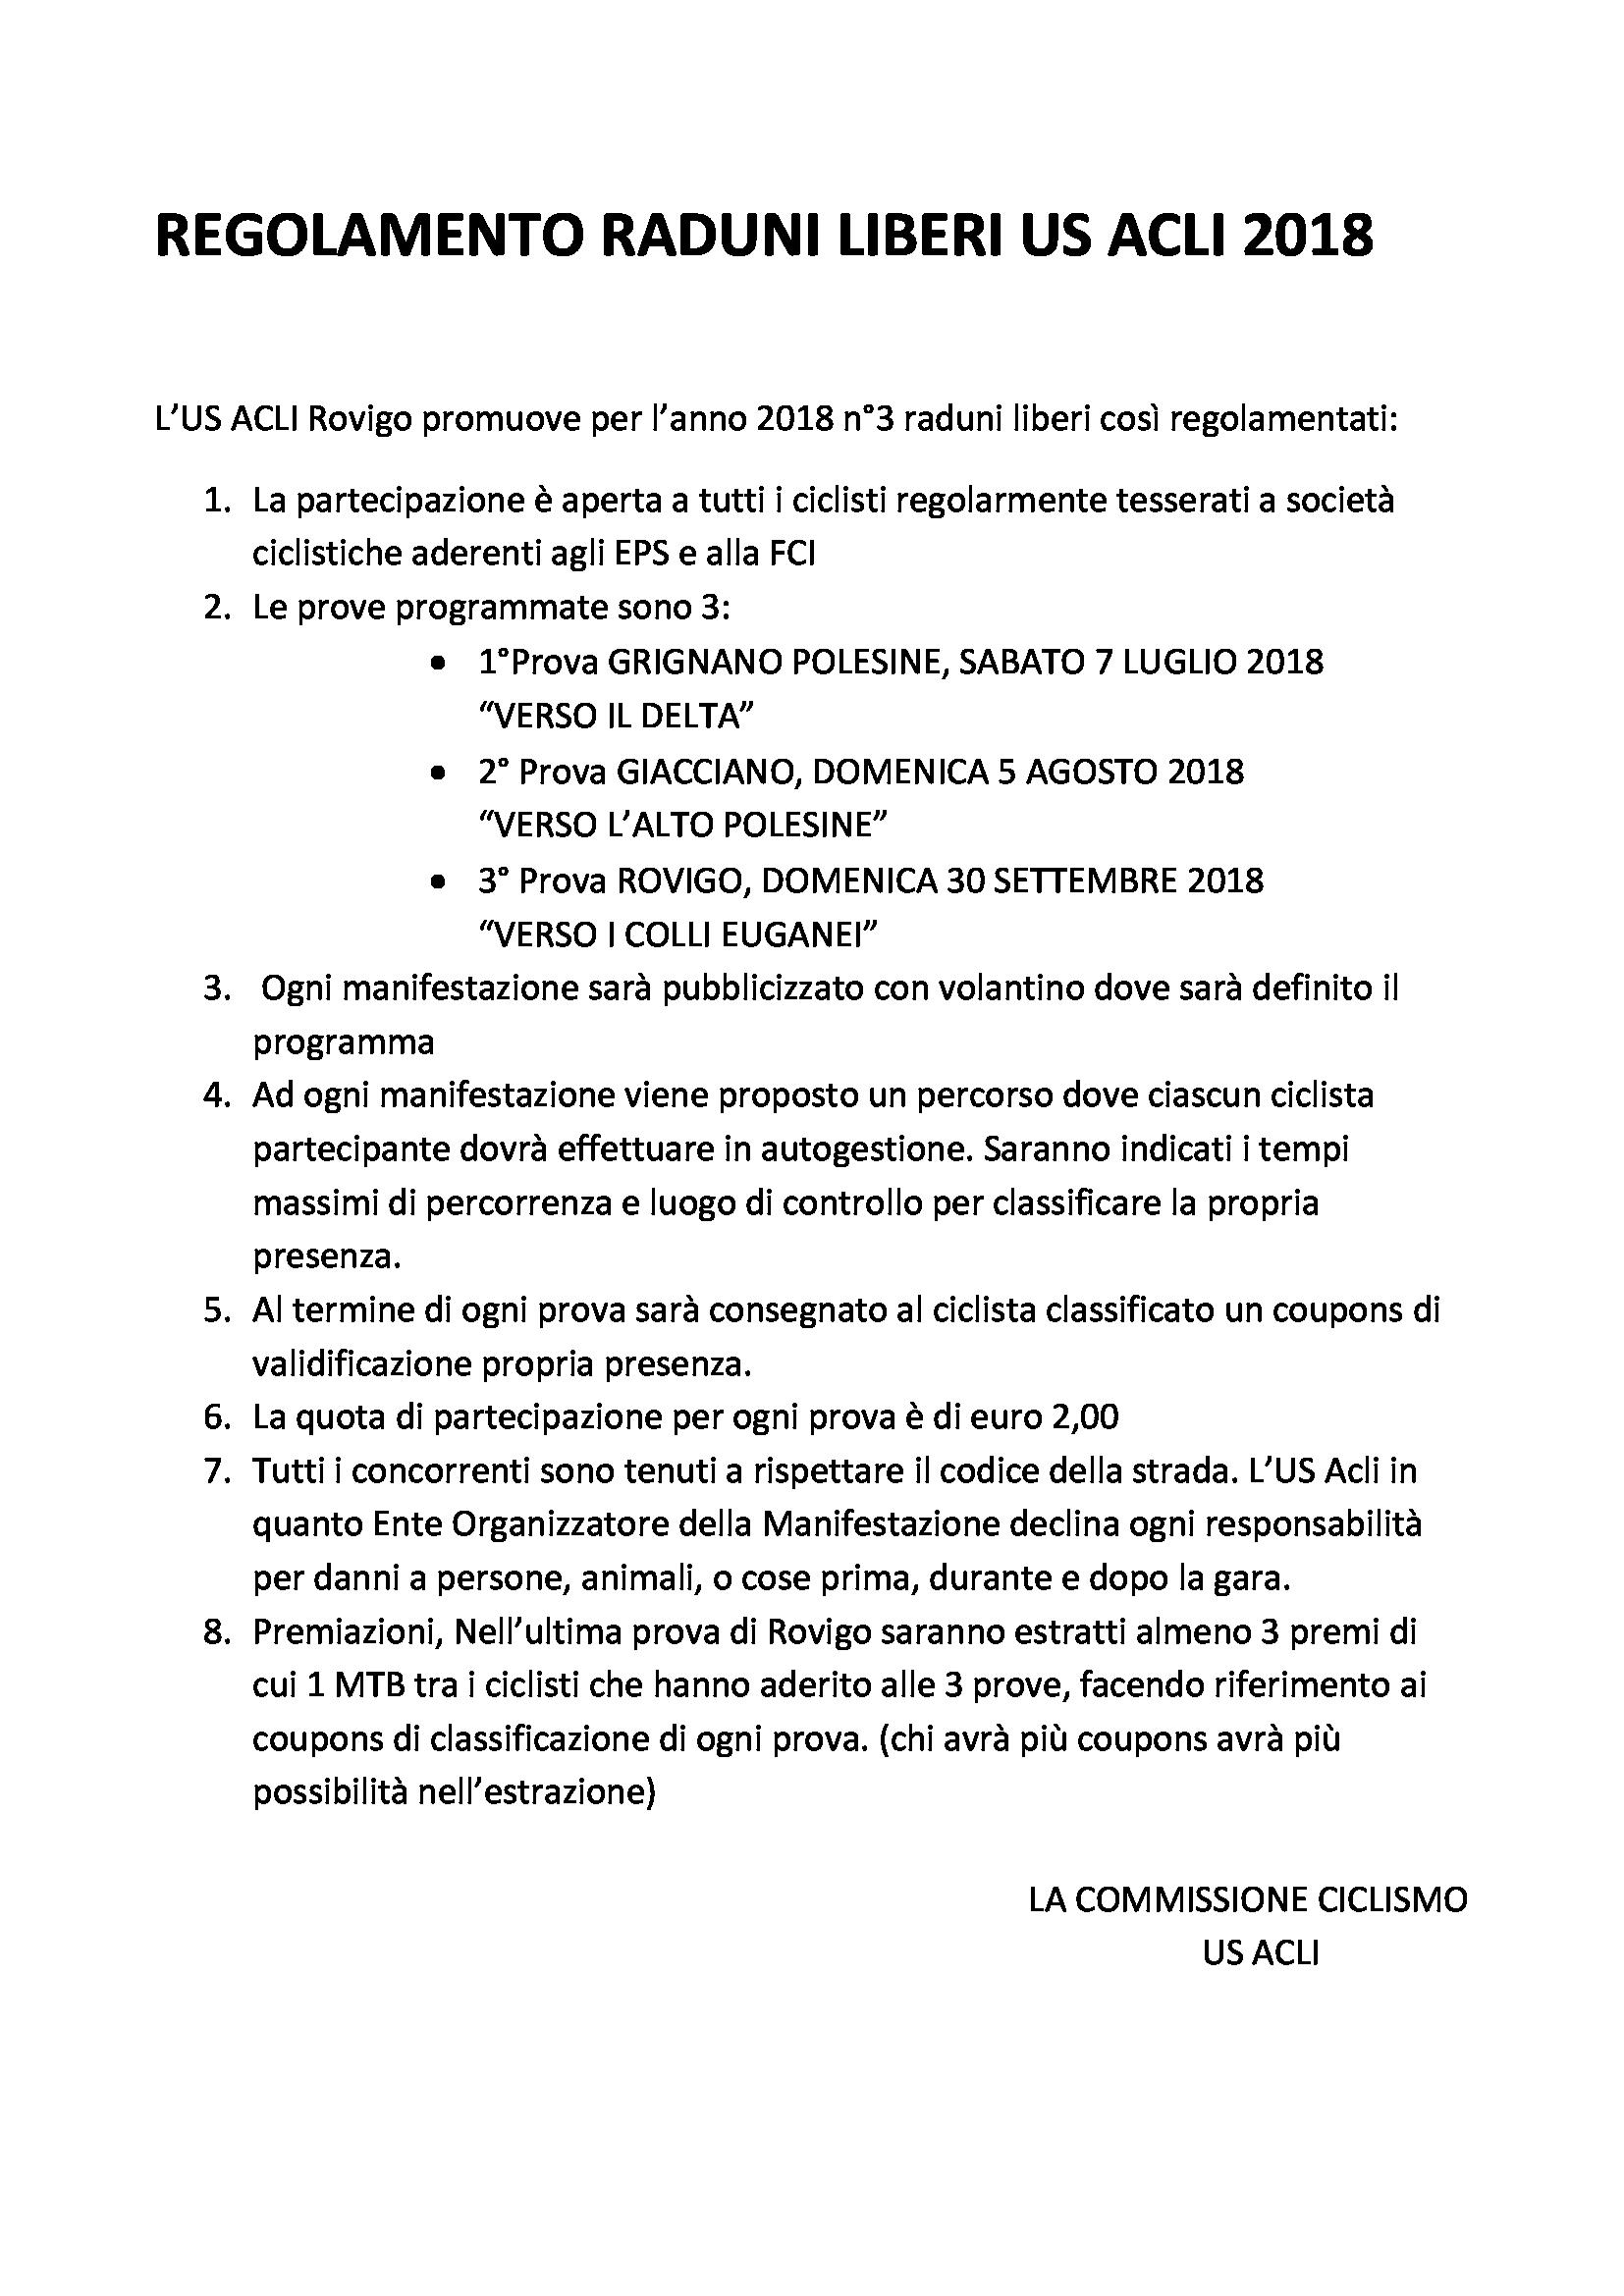 REGOLAMENTO-RADUNI-LIBERI-US-ACLI-2018 JPEG